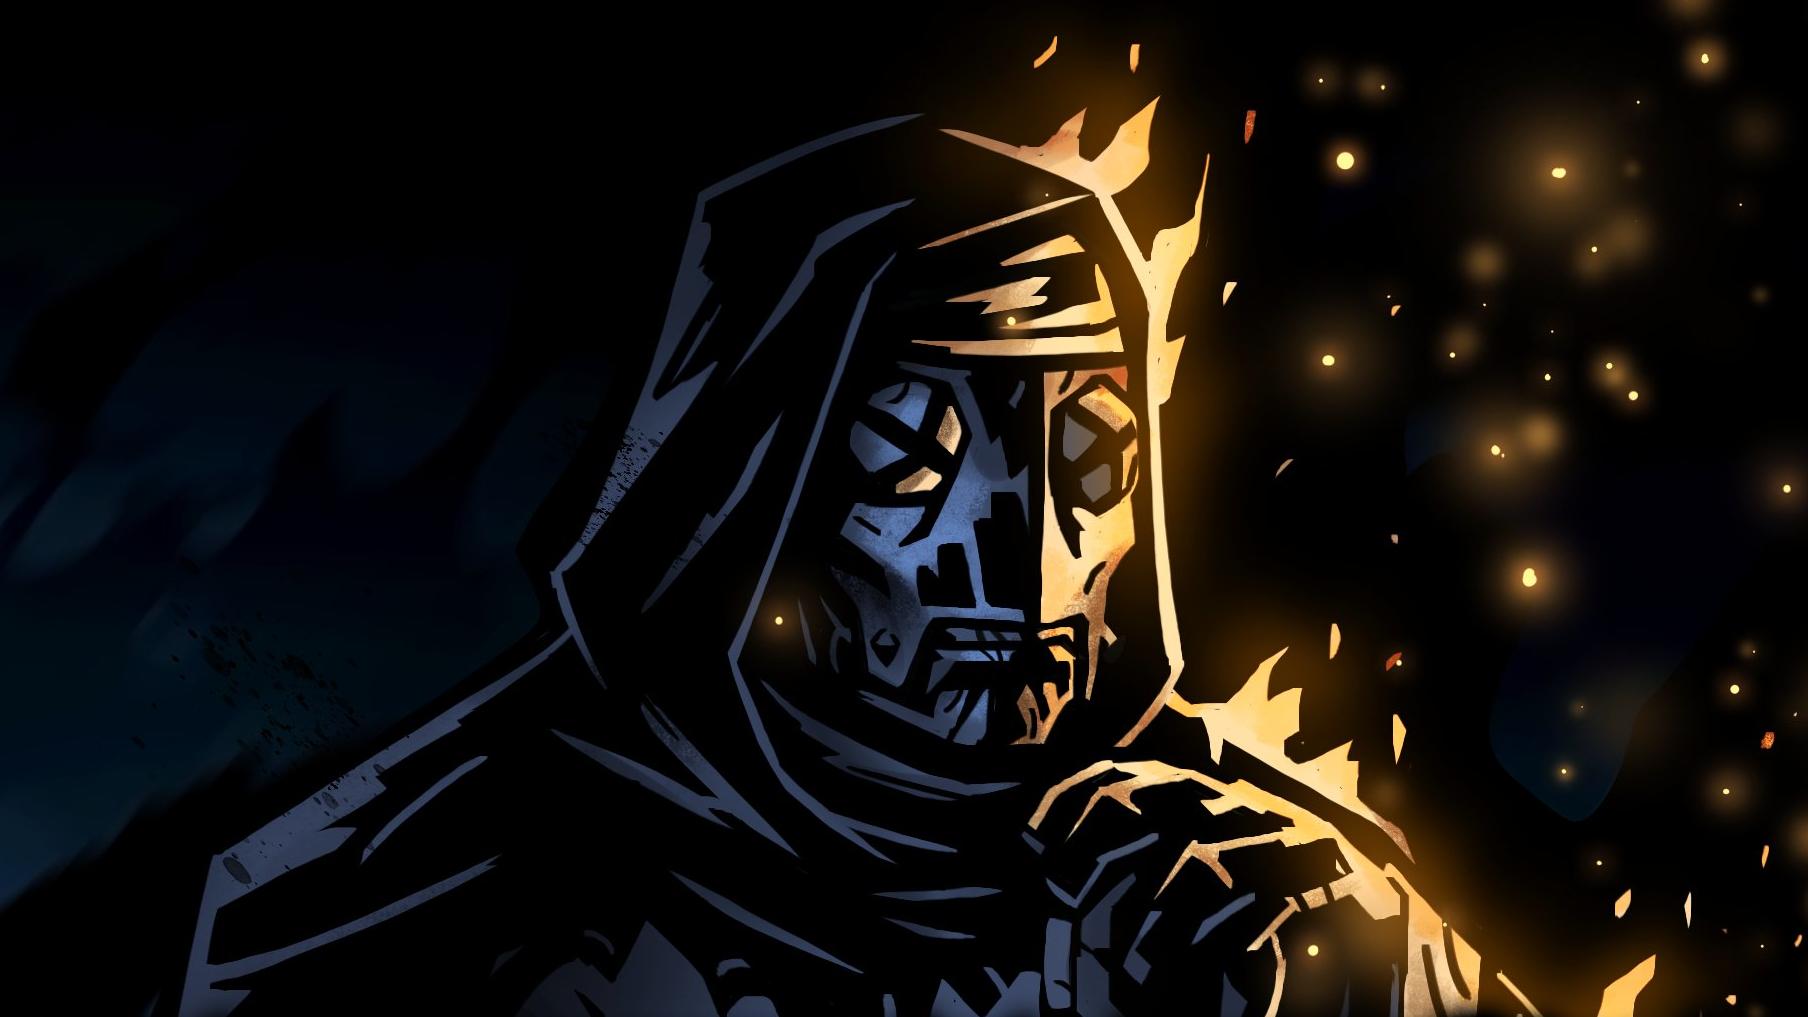 Darkest Dungeon II стартует в раннем доступе 26 октября